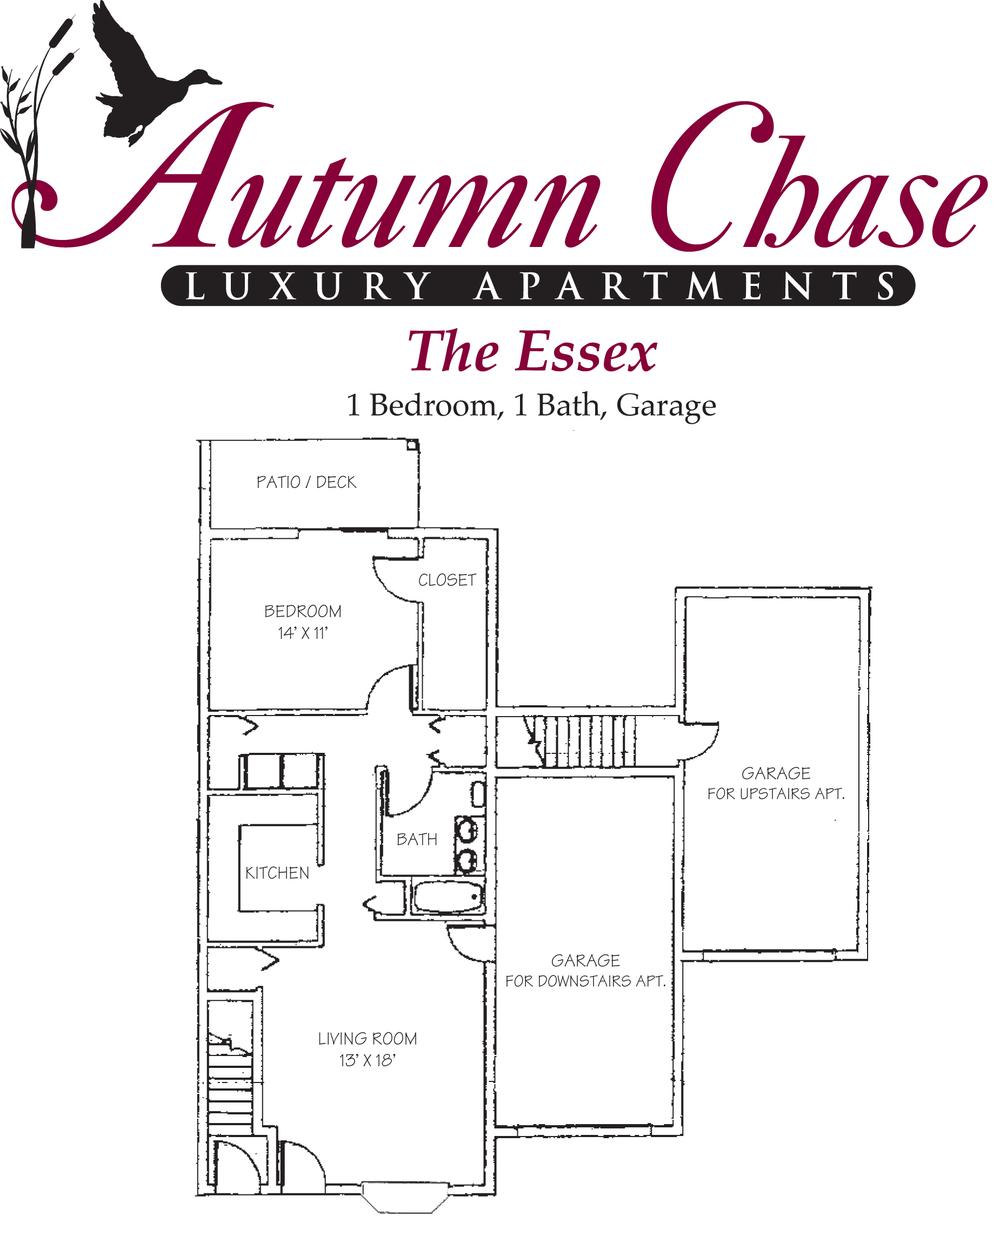 The Essex.jpg